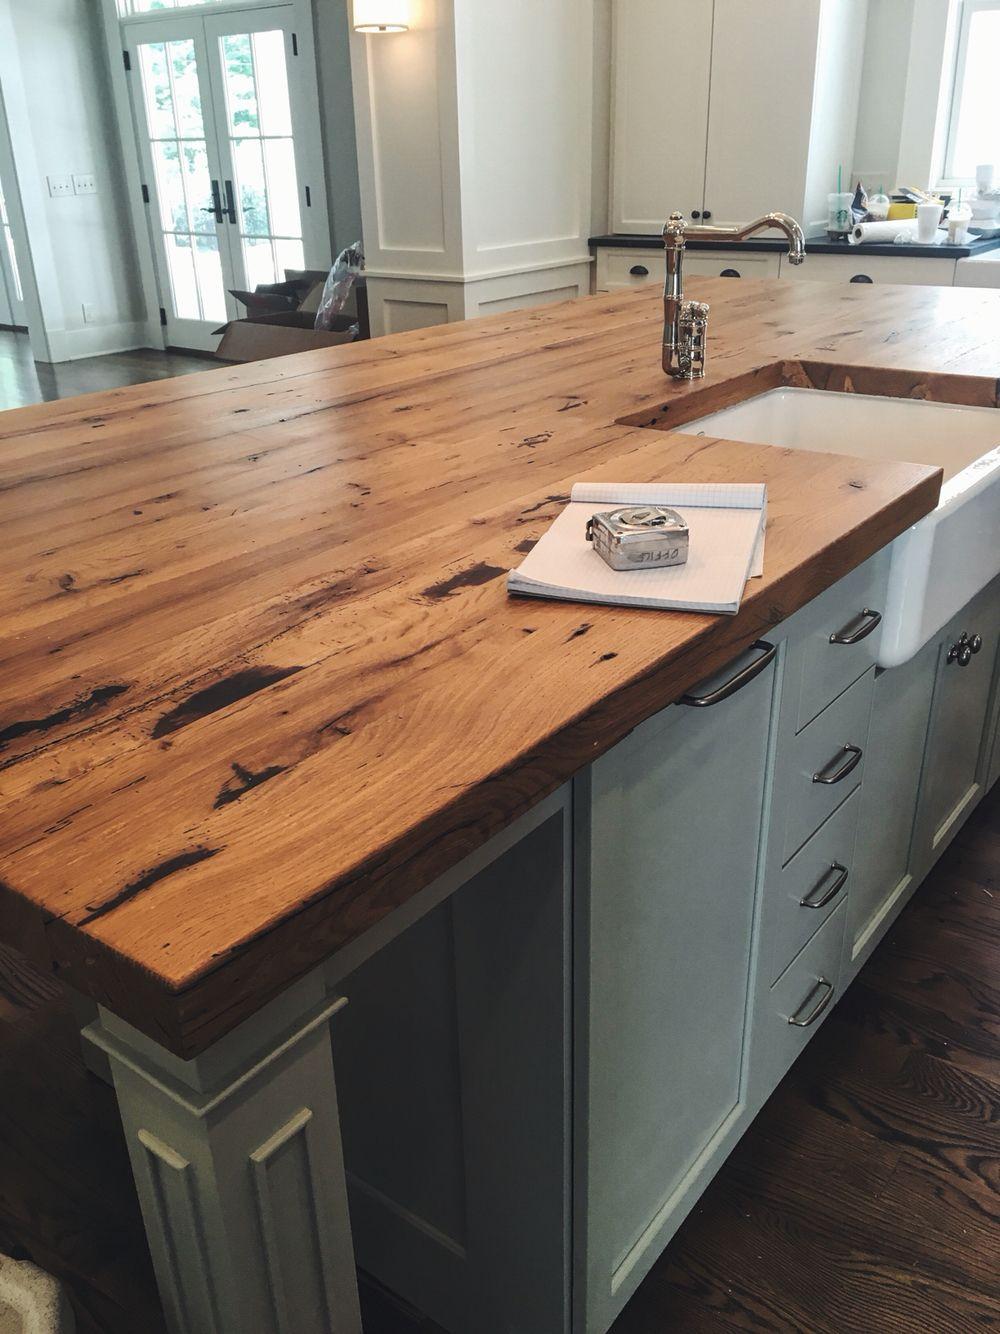 Reclaimed oak kitchen countertop // Built by Woodstock Vintage Lumber in Nashville, TN.